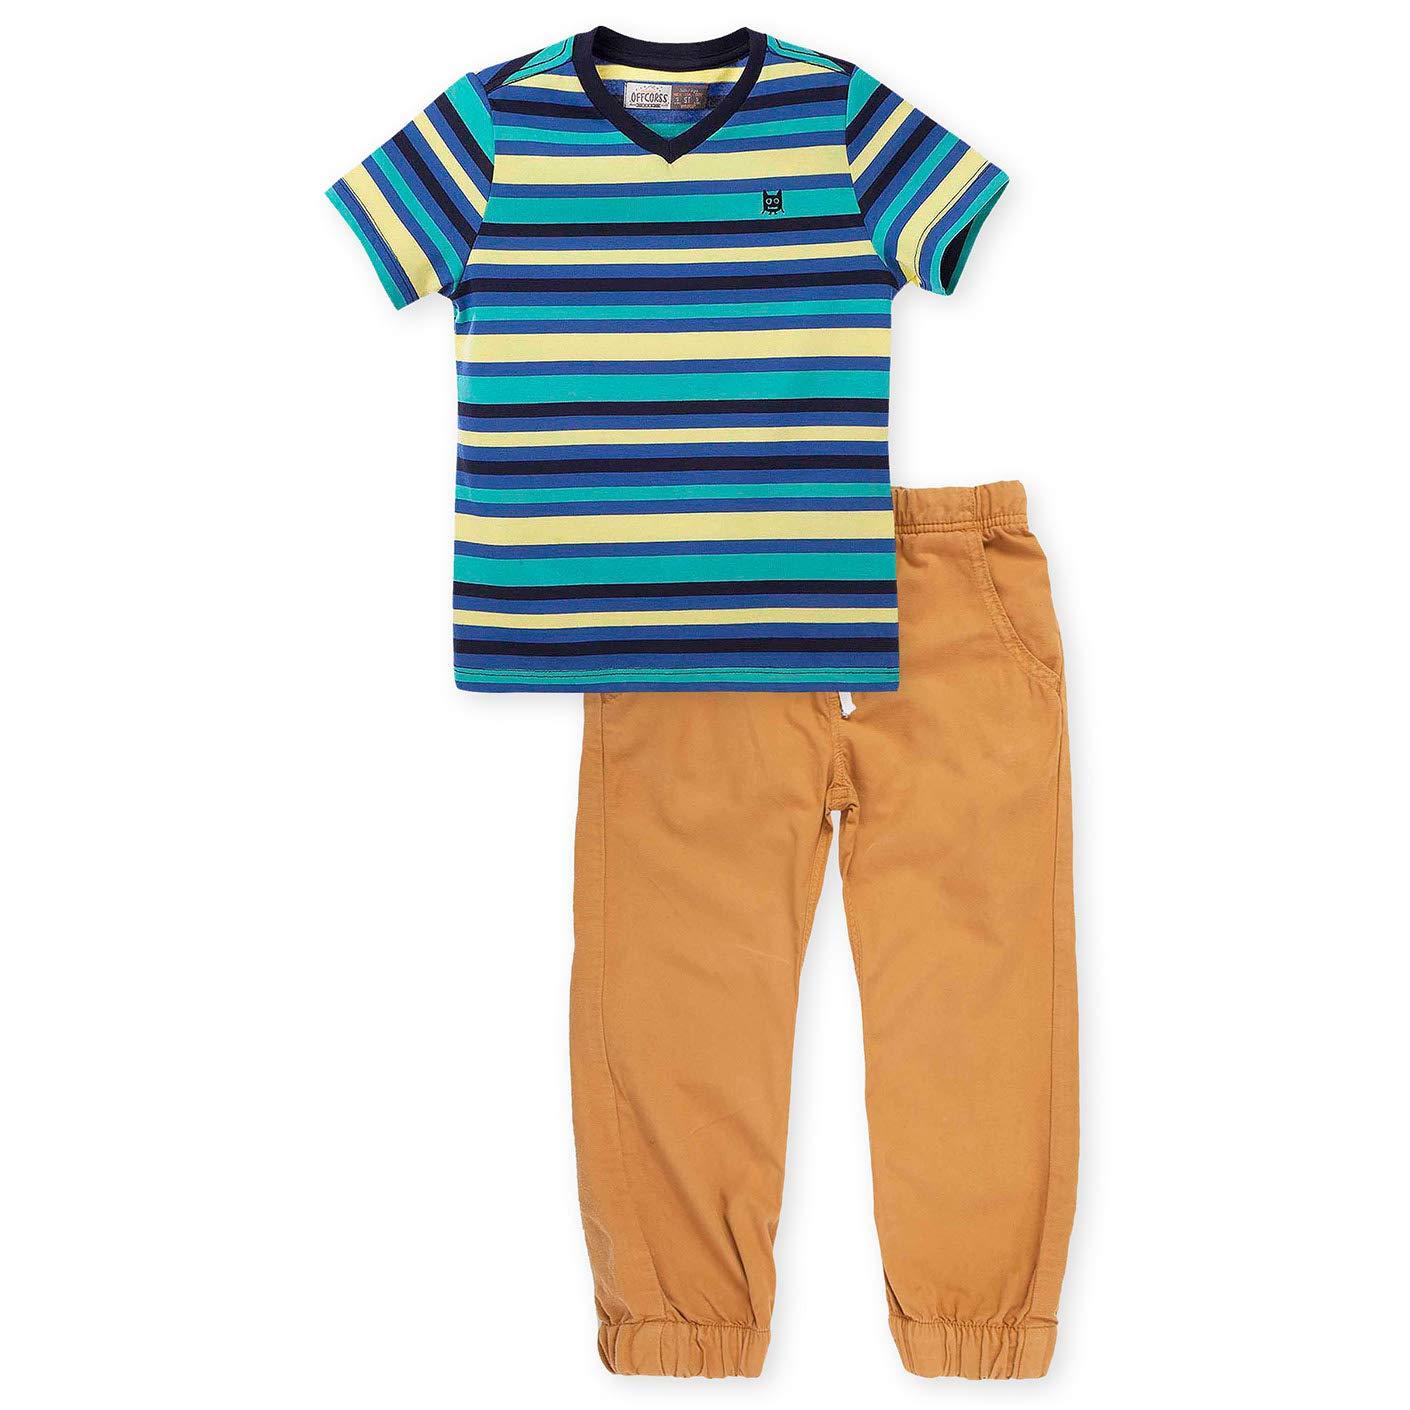 7fe144b18 Amazon.com: OFFCORSS Toddler Boy Cotton T-Shirt + Jogger Pants Set |  Conjuntos de Niños: Clothing